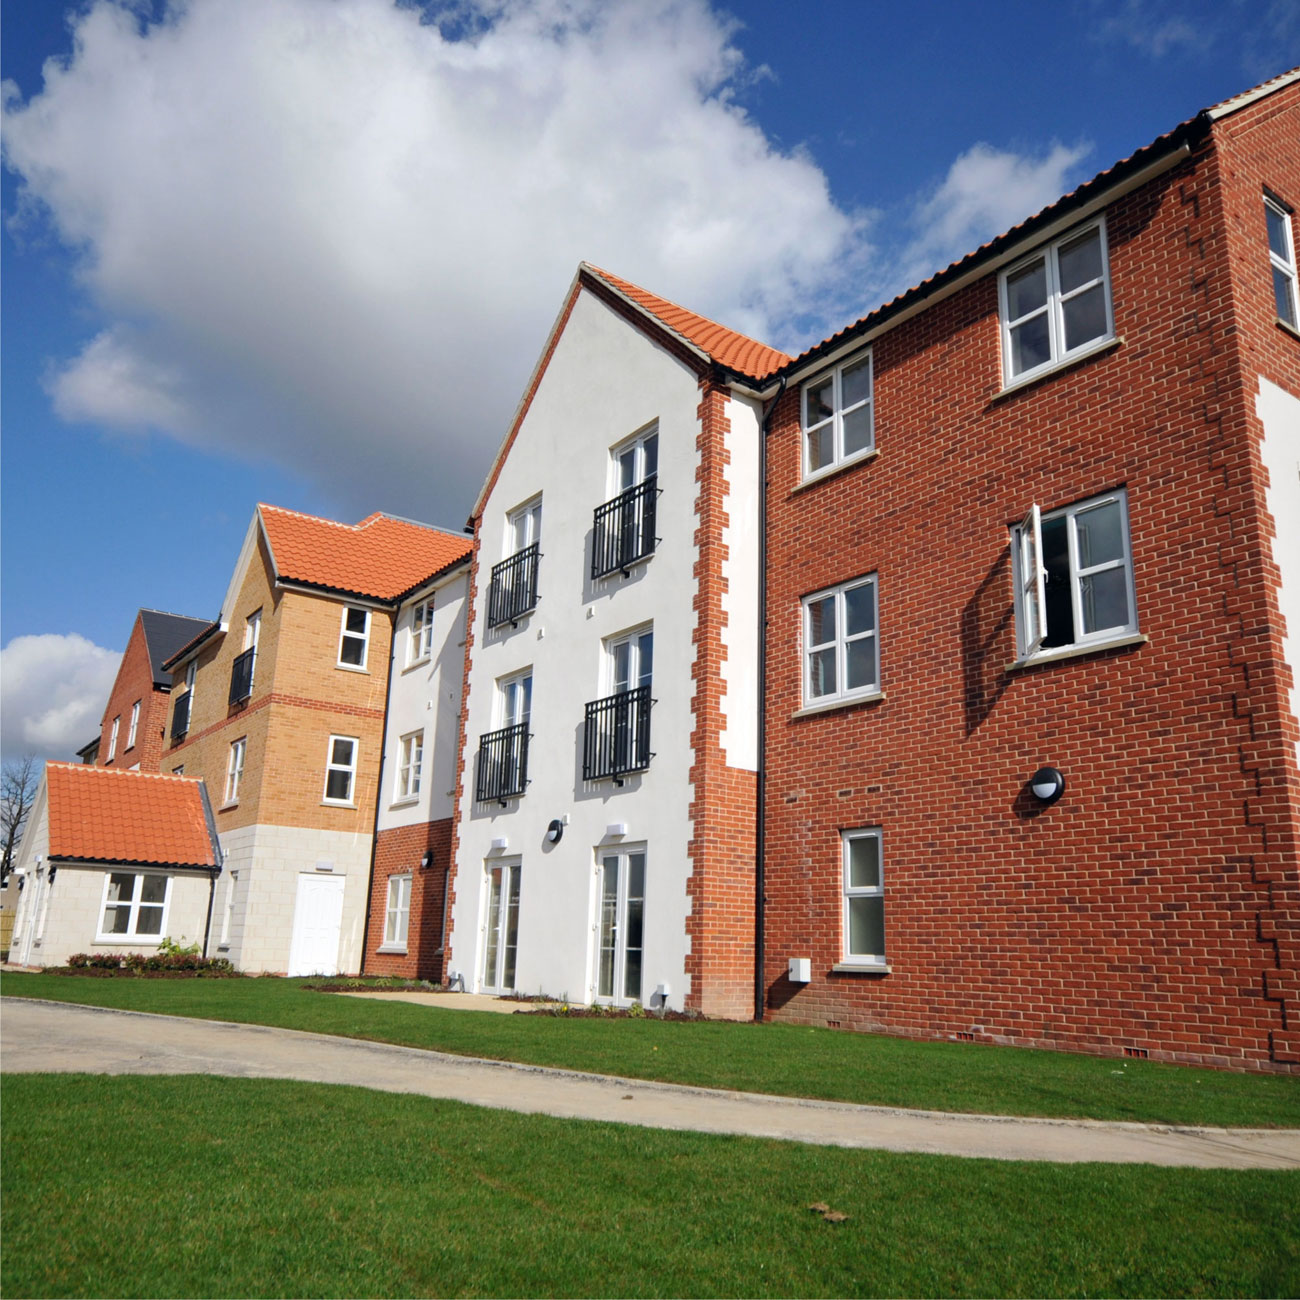 The_Grange_Romford_Care_Home